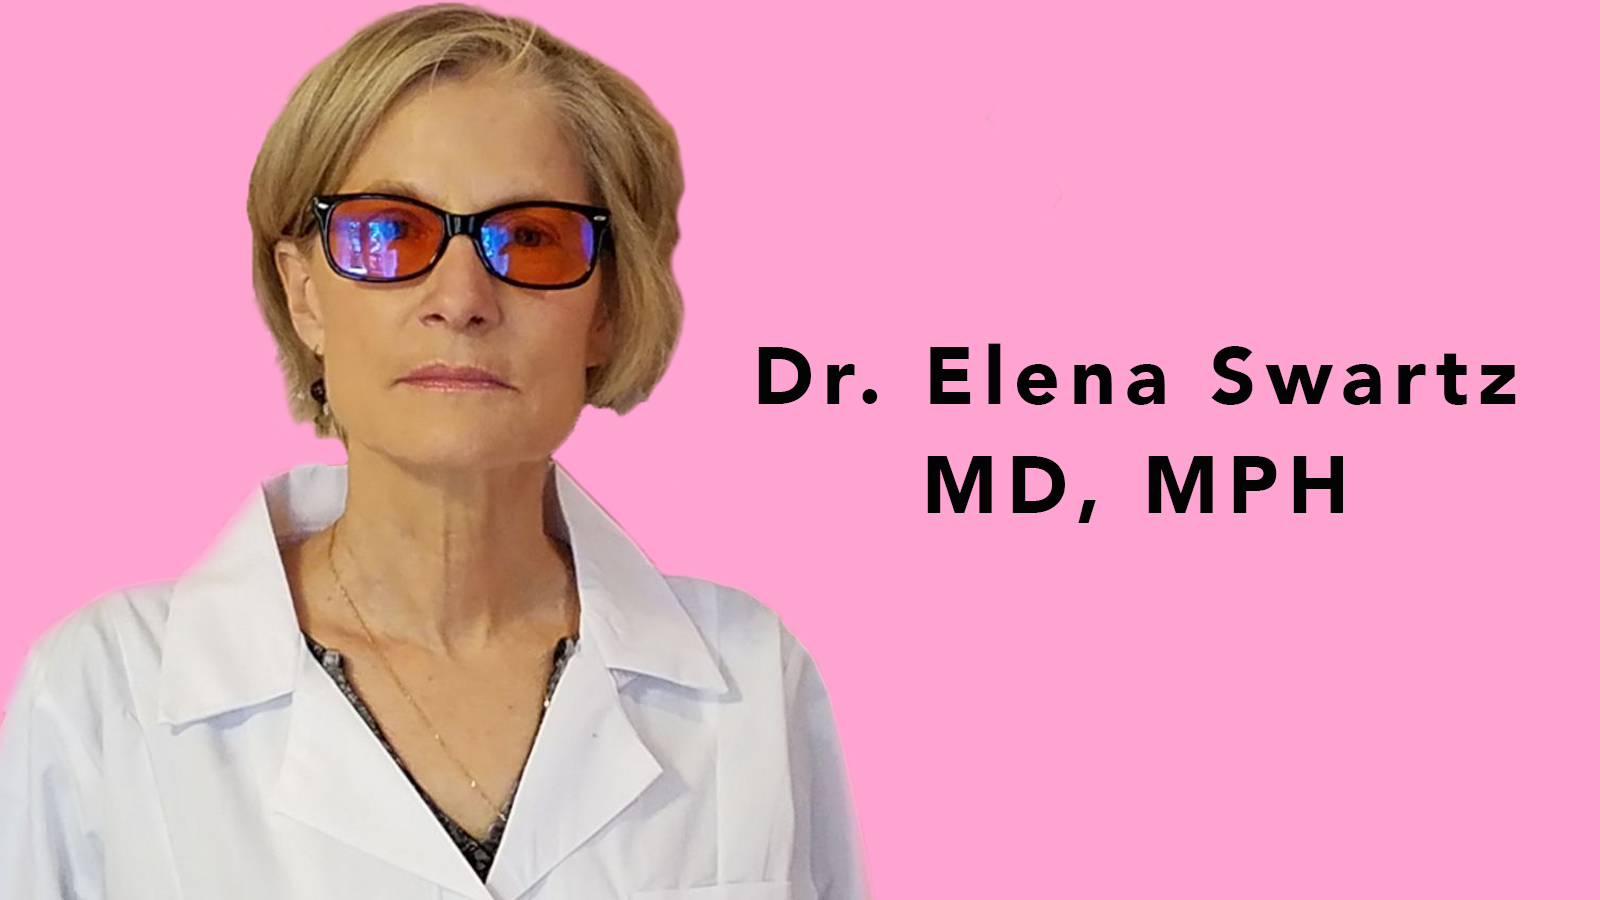 Dr. Elena Swartz, MD, MPH